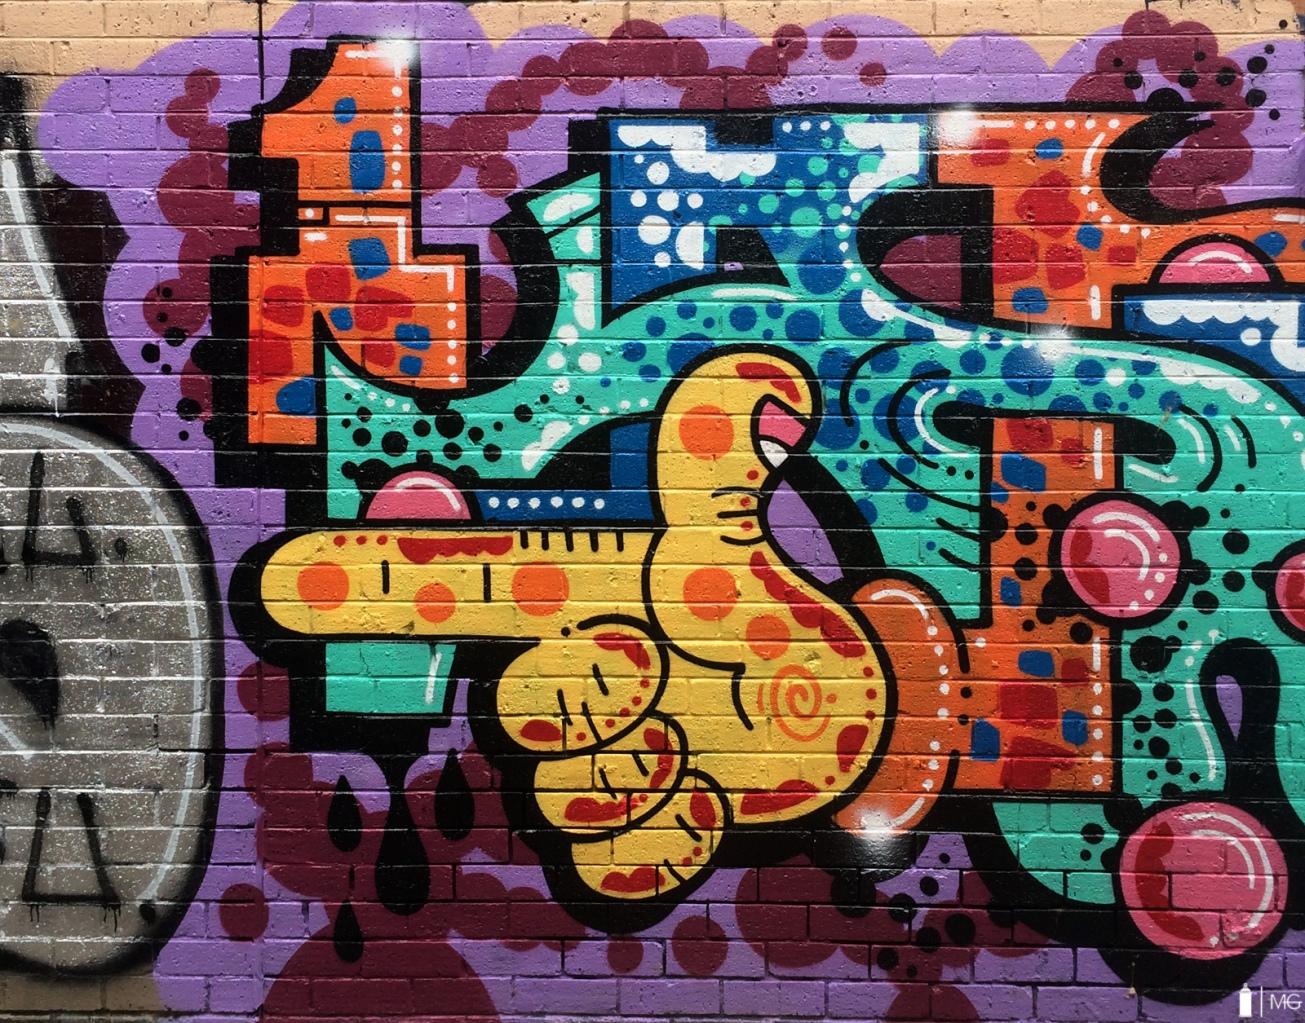 Kaput-Rust86-Olar-Yser-Brunswick-Graffiti-Morning-Glory-Melbourne9